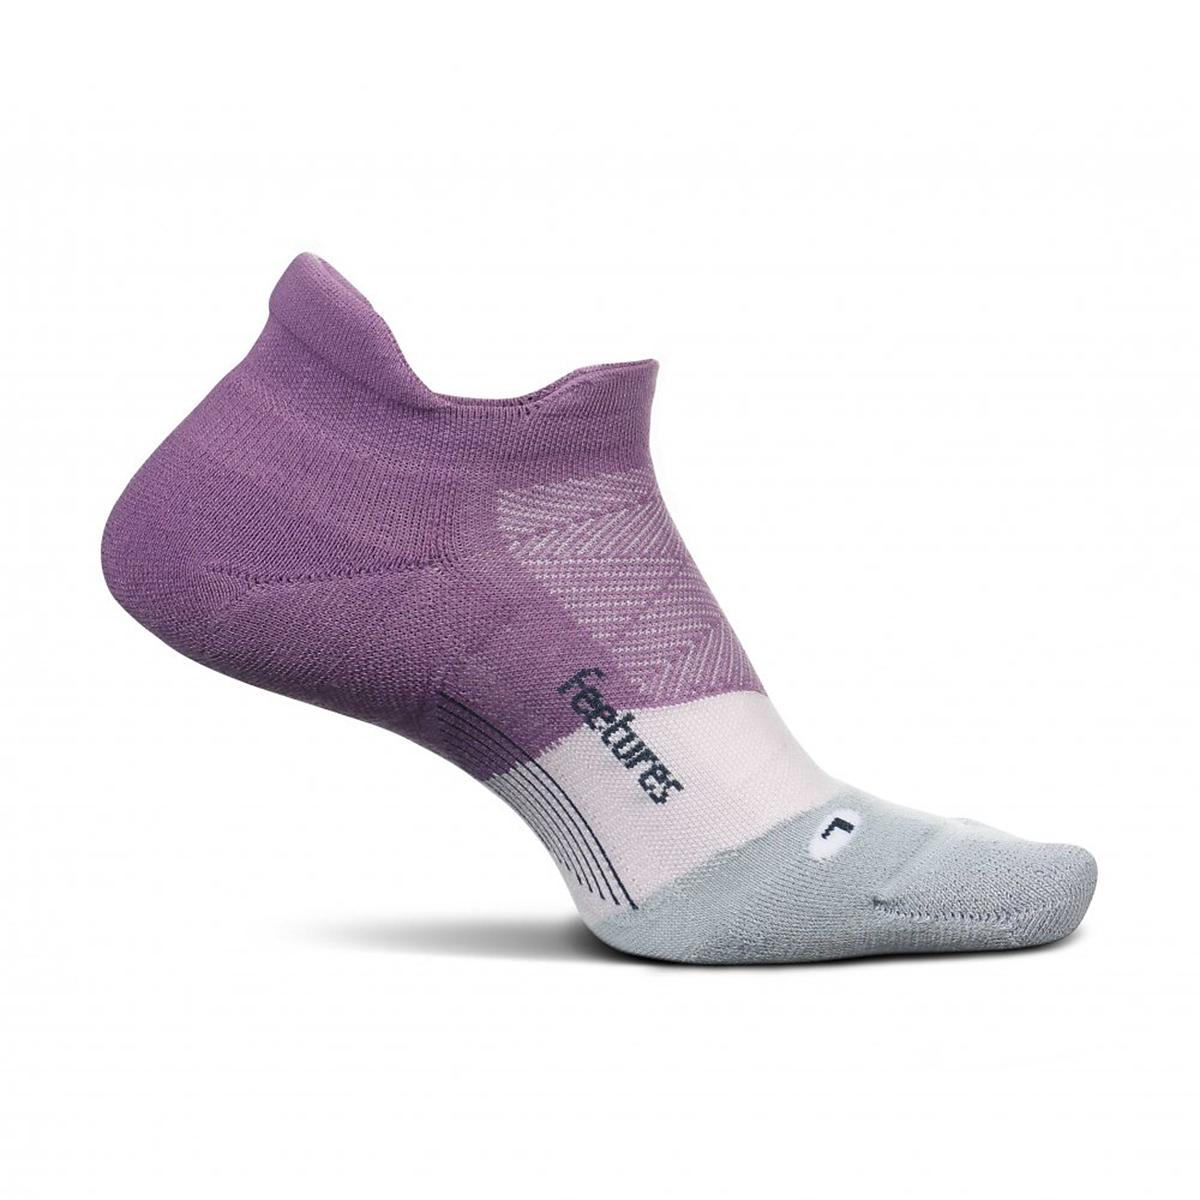 Feetures Elite Max Cushion No Show Sock - Color: Purple Nitro - Size: S, Purple Nitro, large, image 1